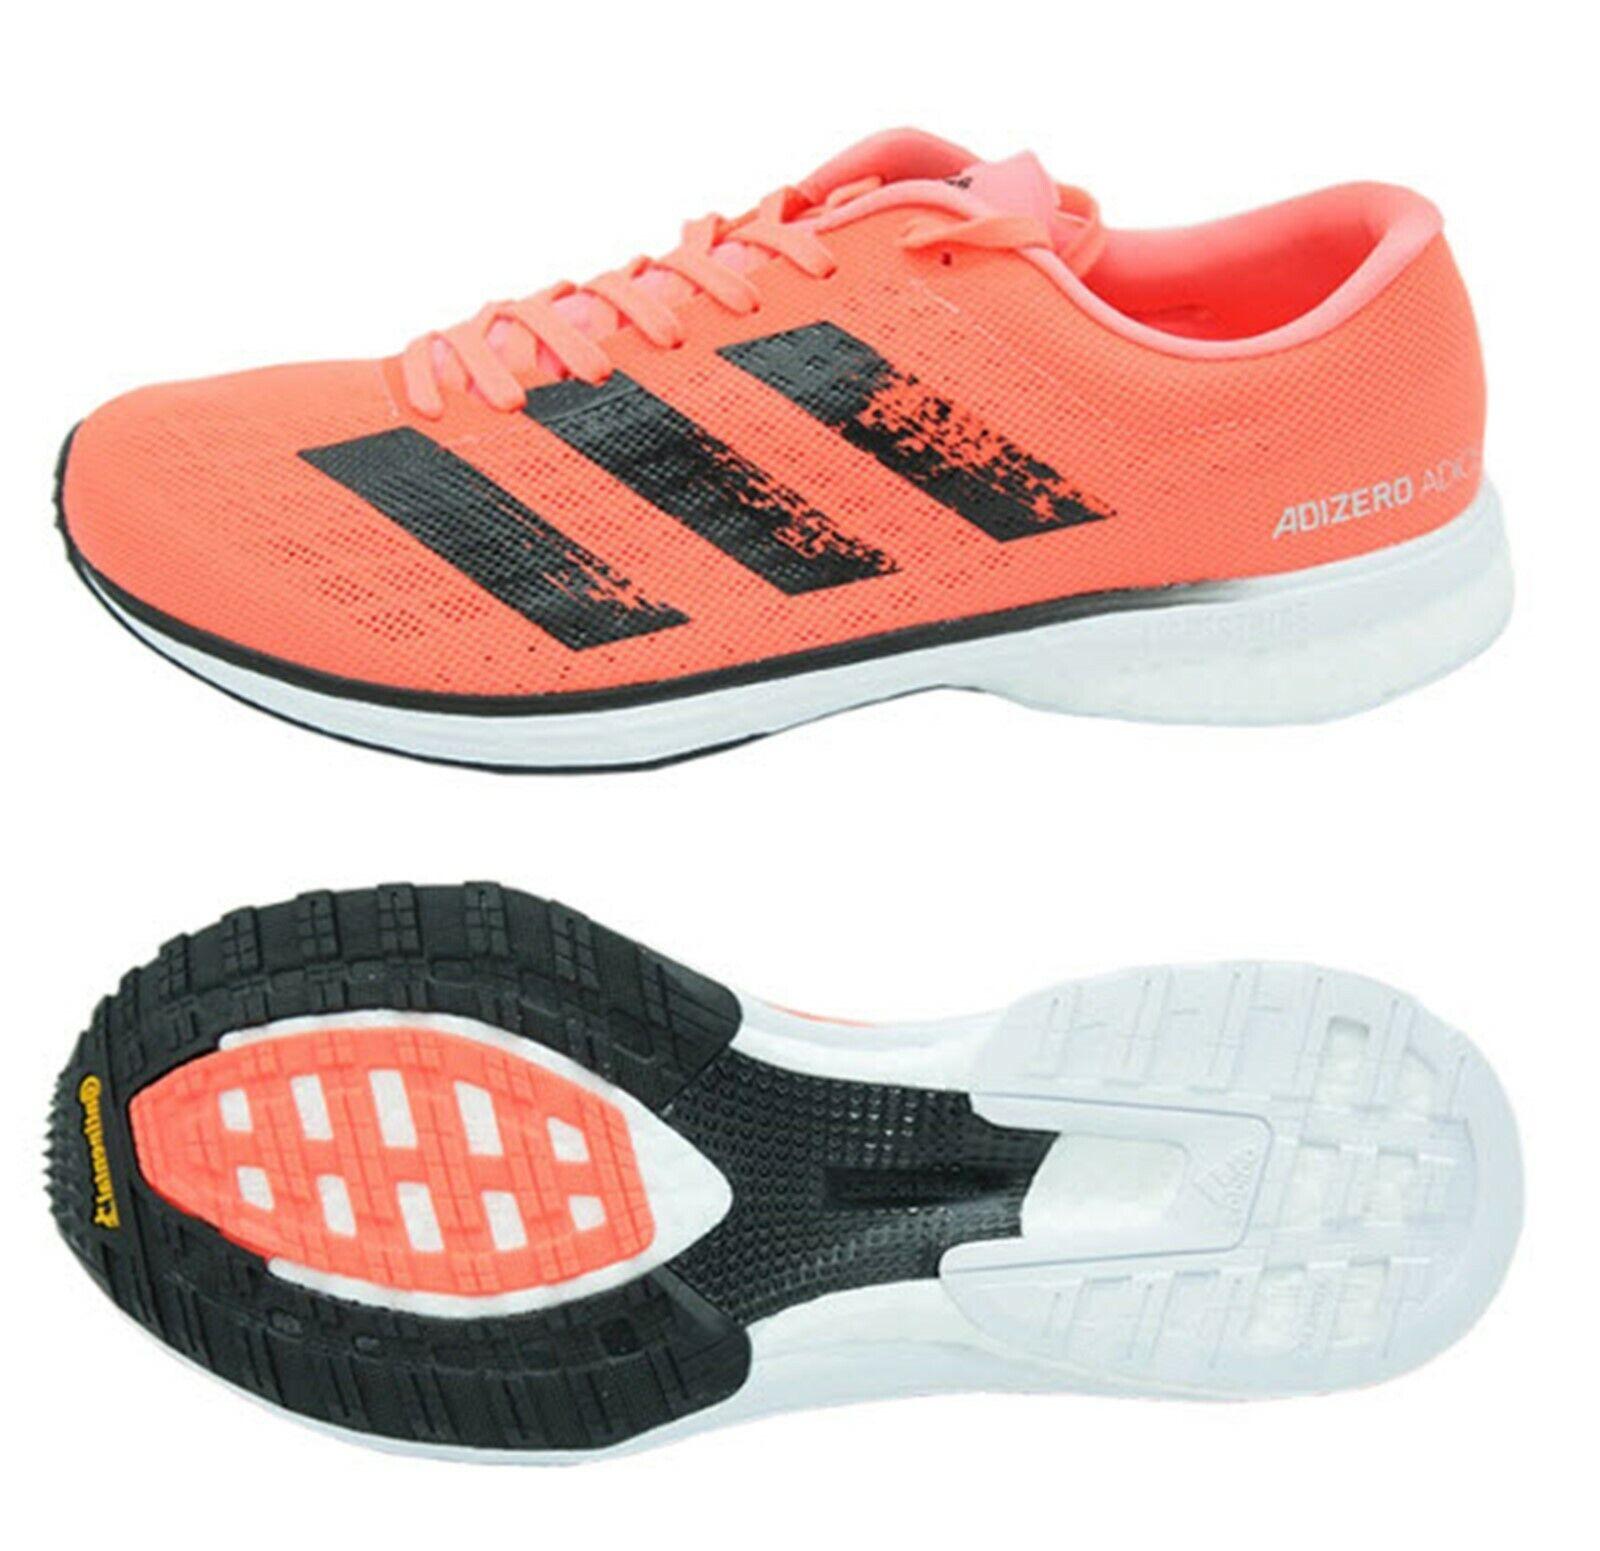 Adidas Men Adizero Adios 5 Shoes